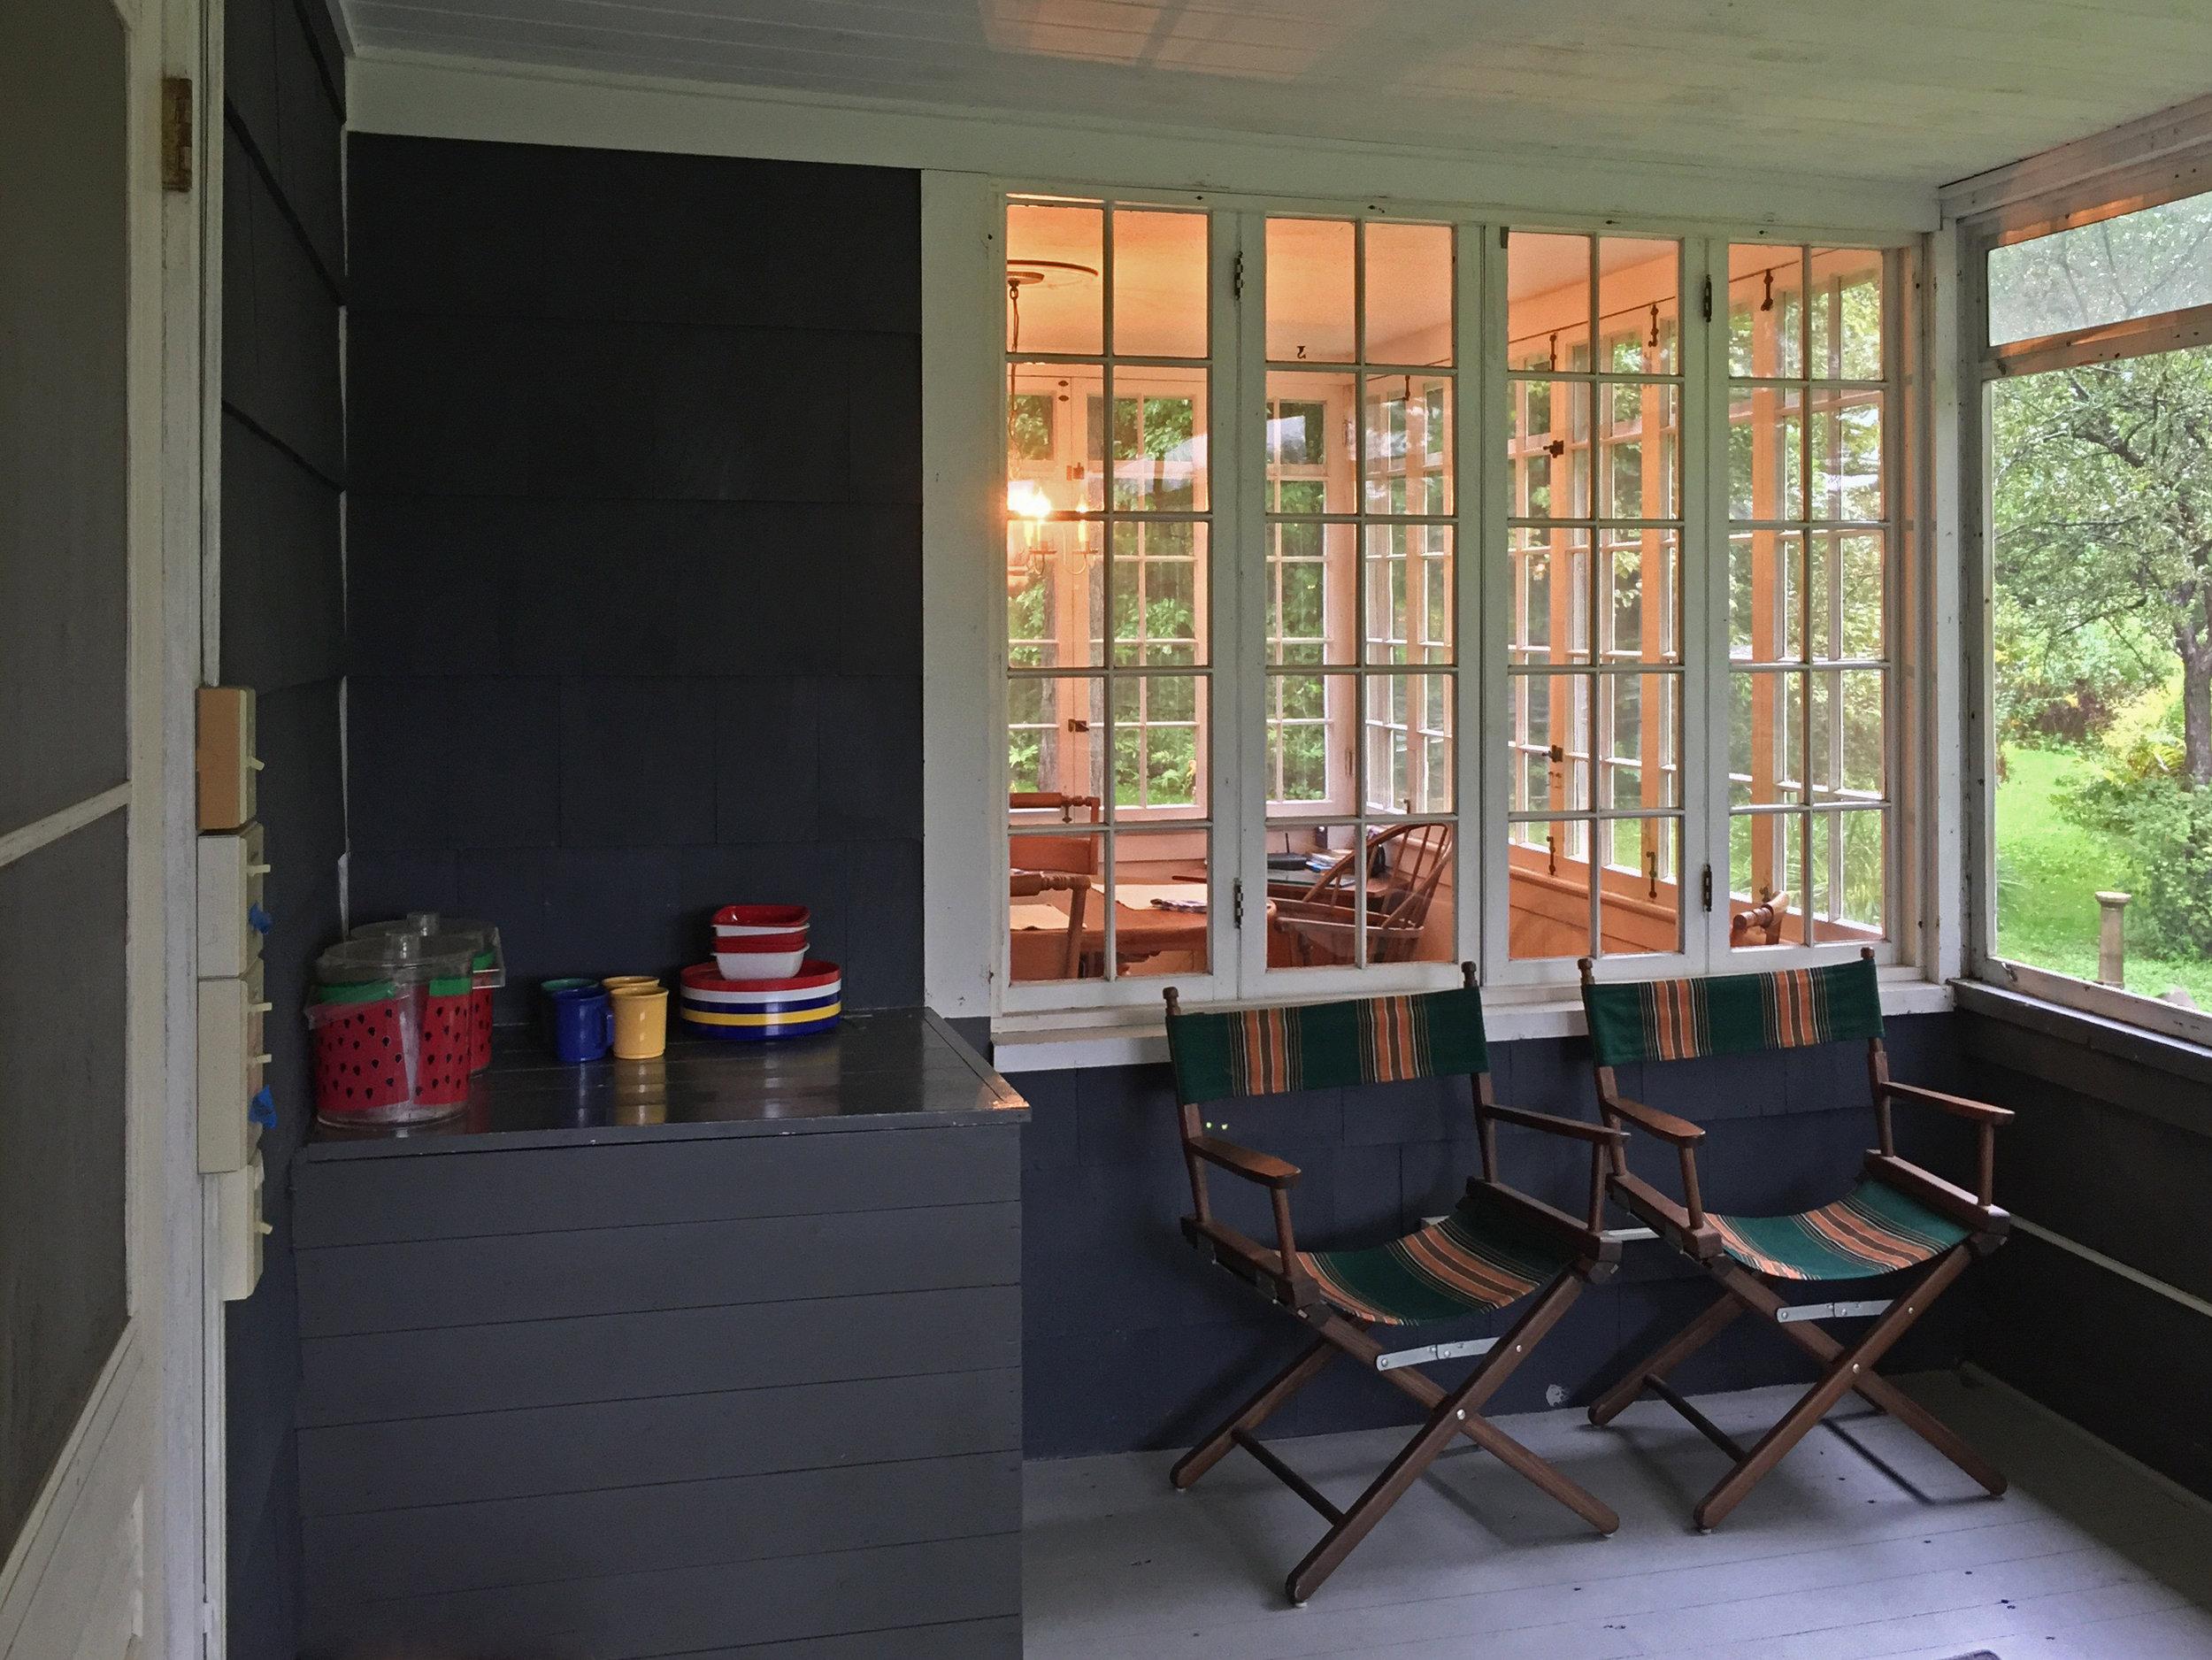 28-2017-09-02 IMG_1741 Hanson Porch to Dining Room.jpg